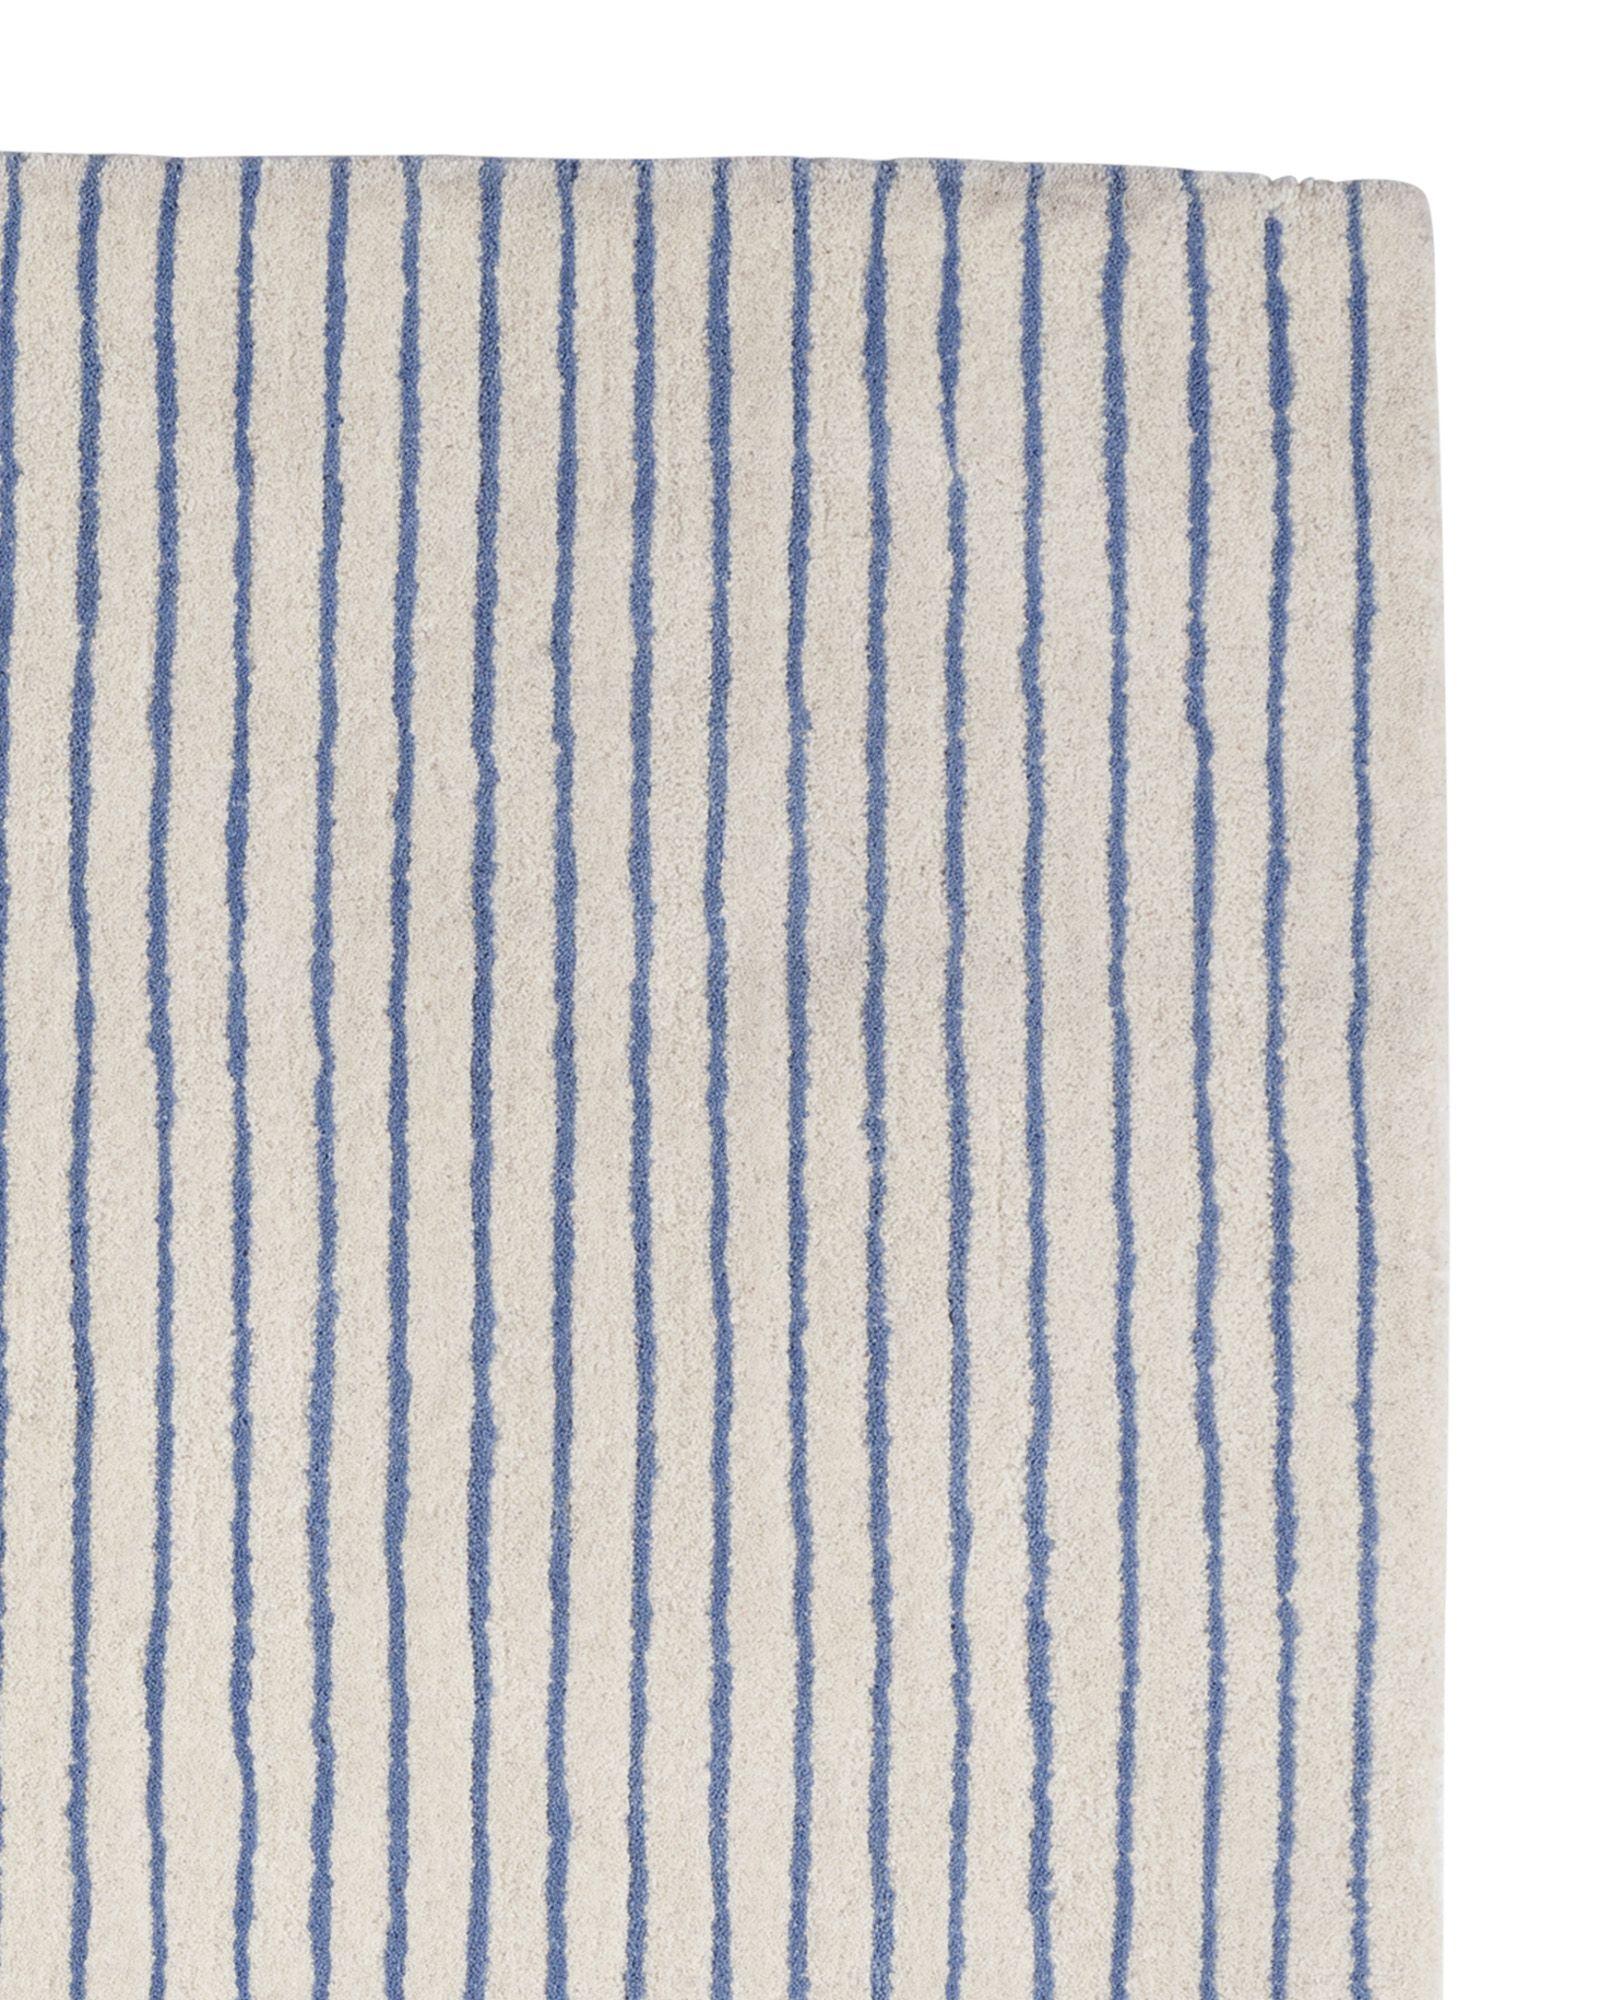 Pencil Stripe Rug